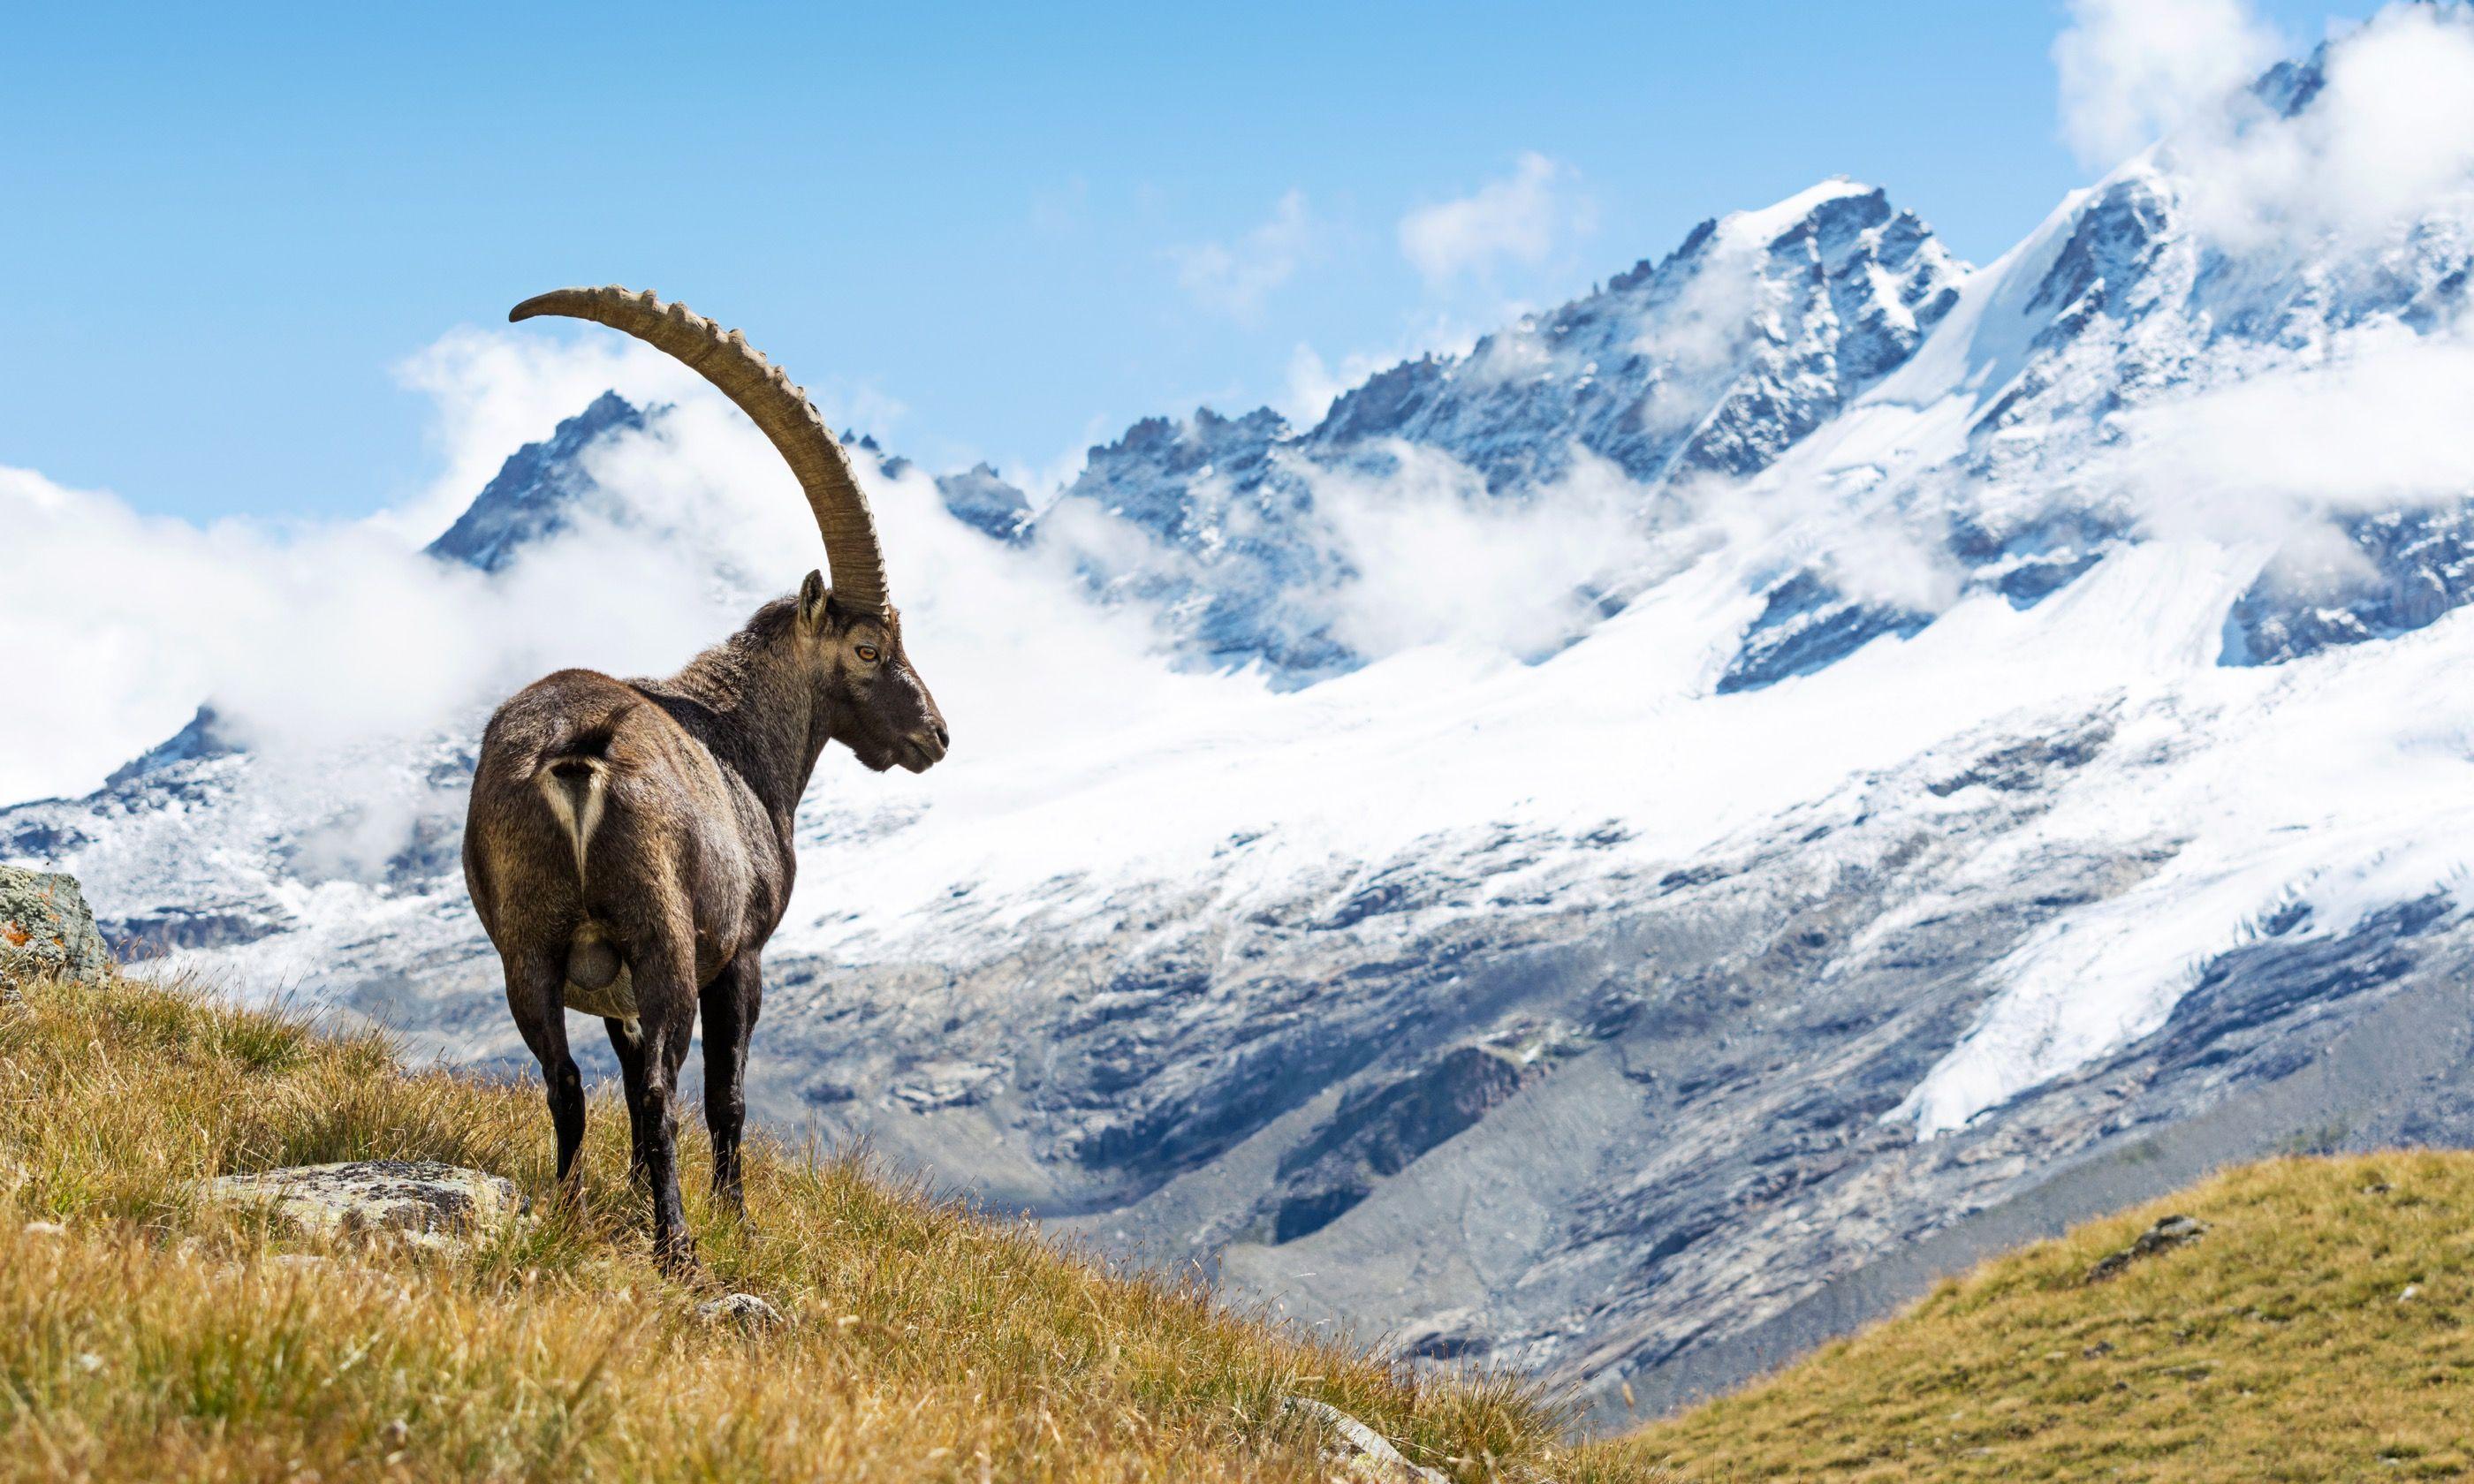 Alpine Ibex in Gran Paradiso National Park (Dreamstime)